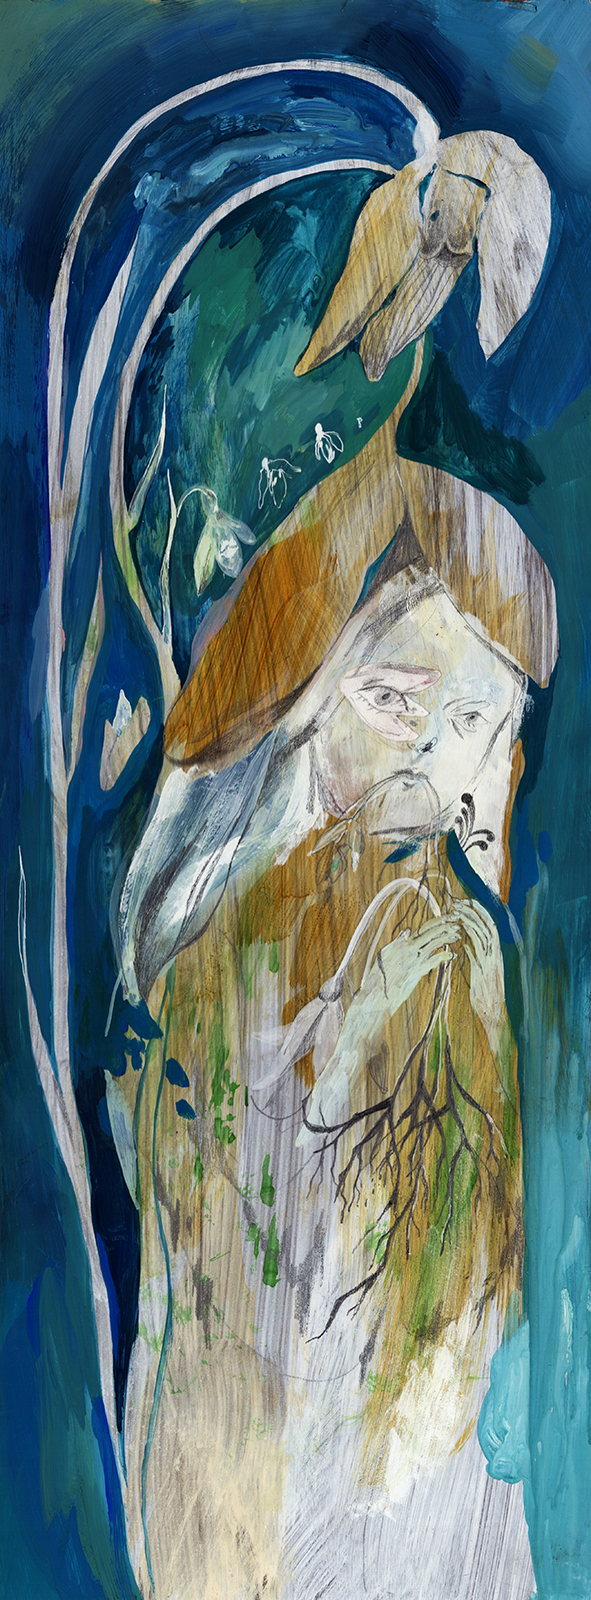 Illustration by Hannah Kim